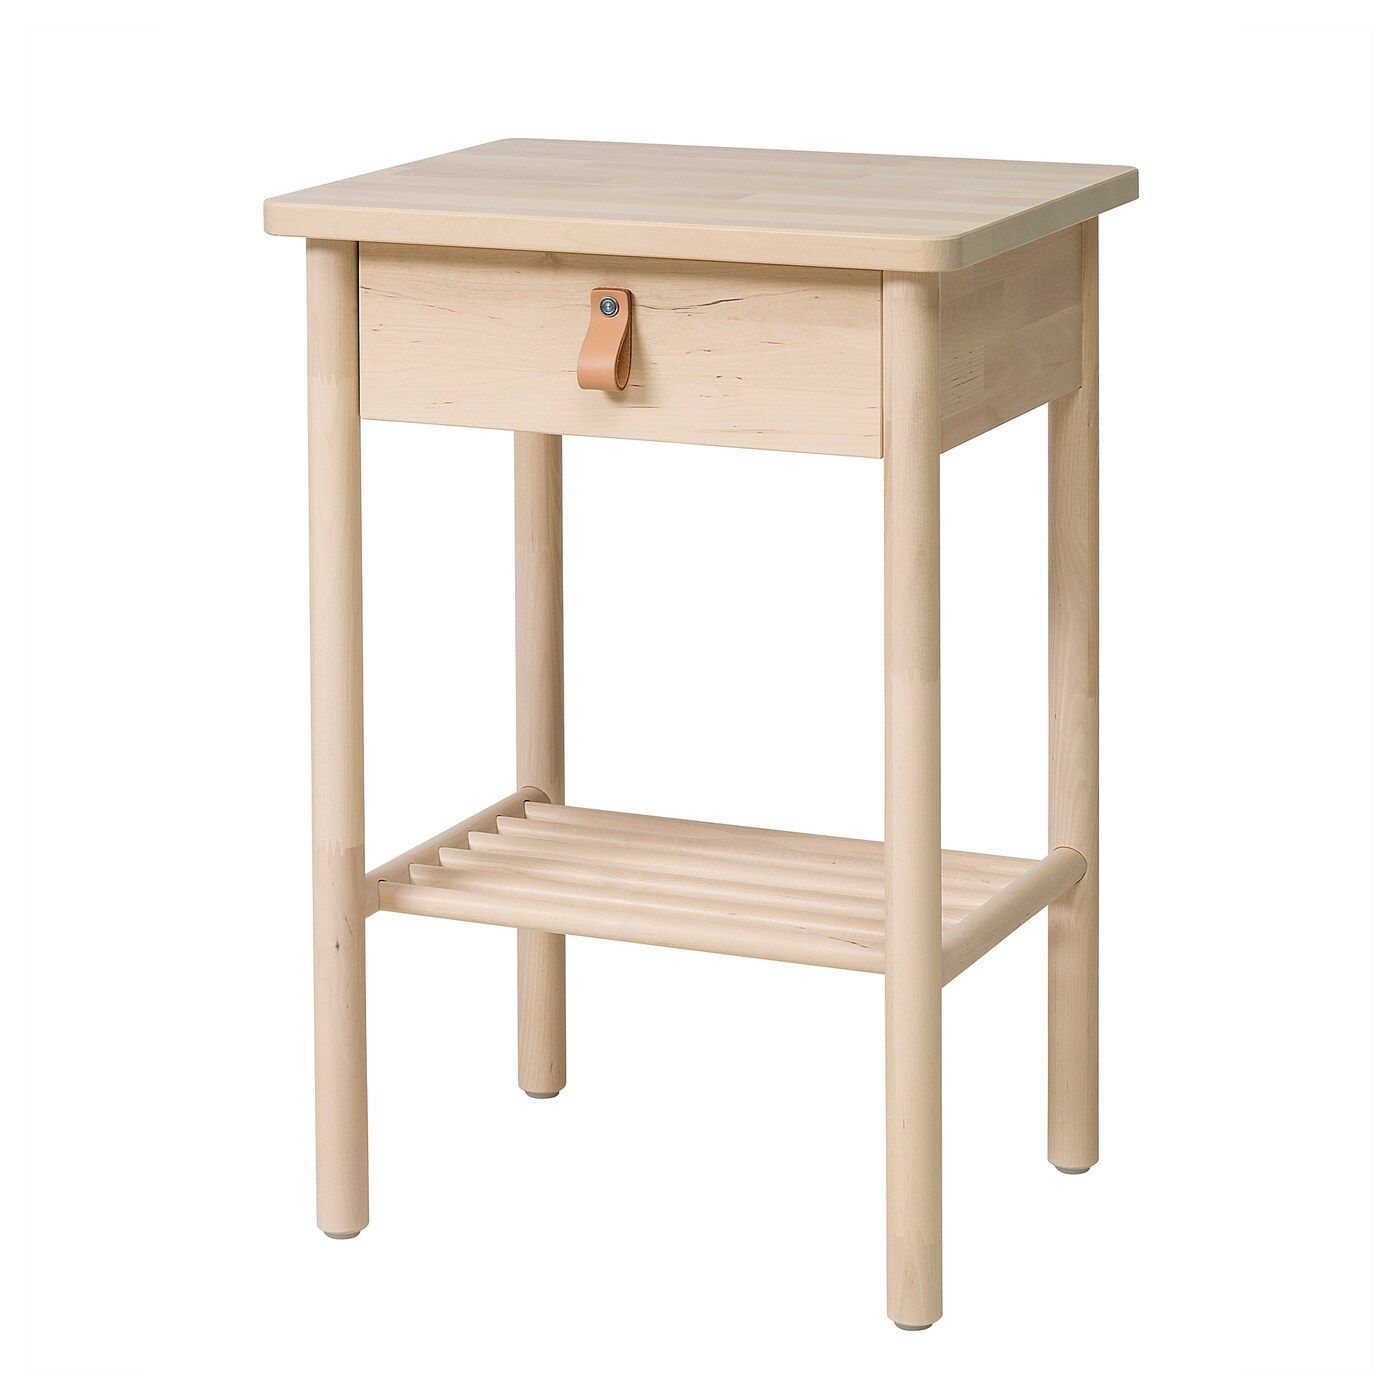 Bjorksnas Nightstand Birch Ikea In 2020 Cheap Living Room Furniture Furniture Cool Furniture [ 1400 x 1400 Pixel ]